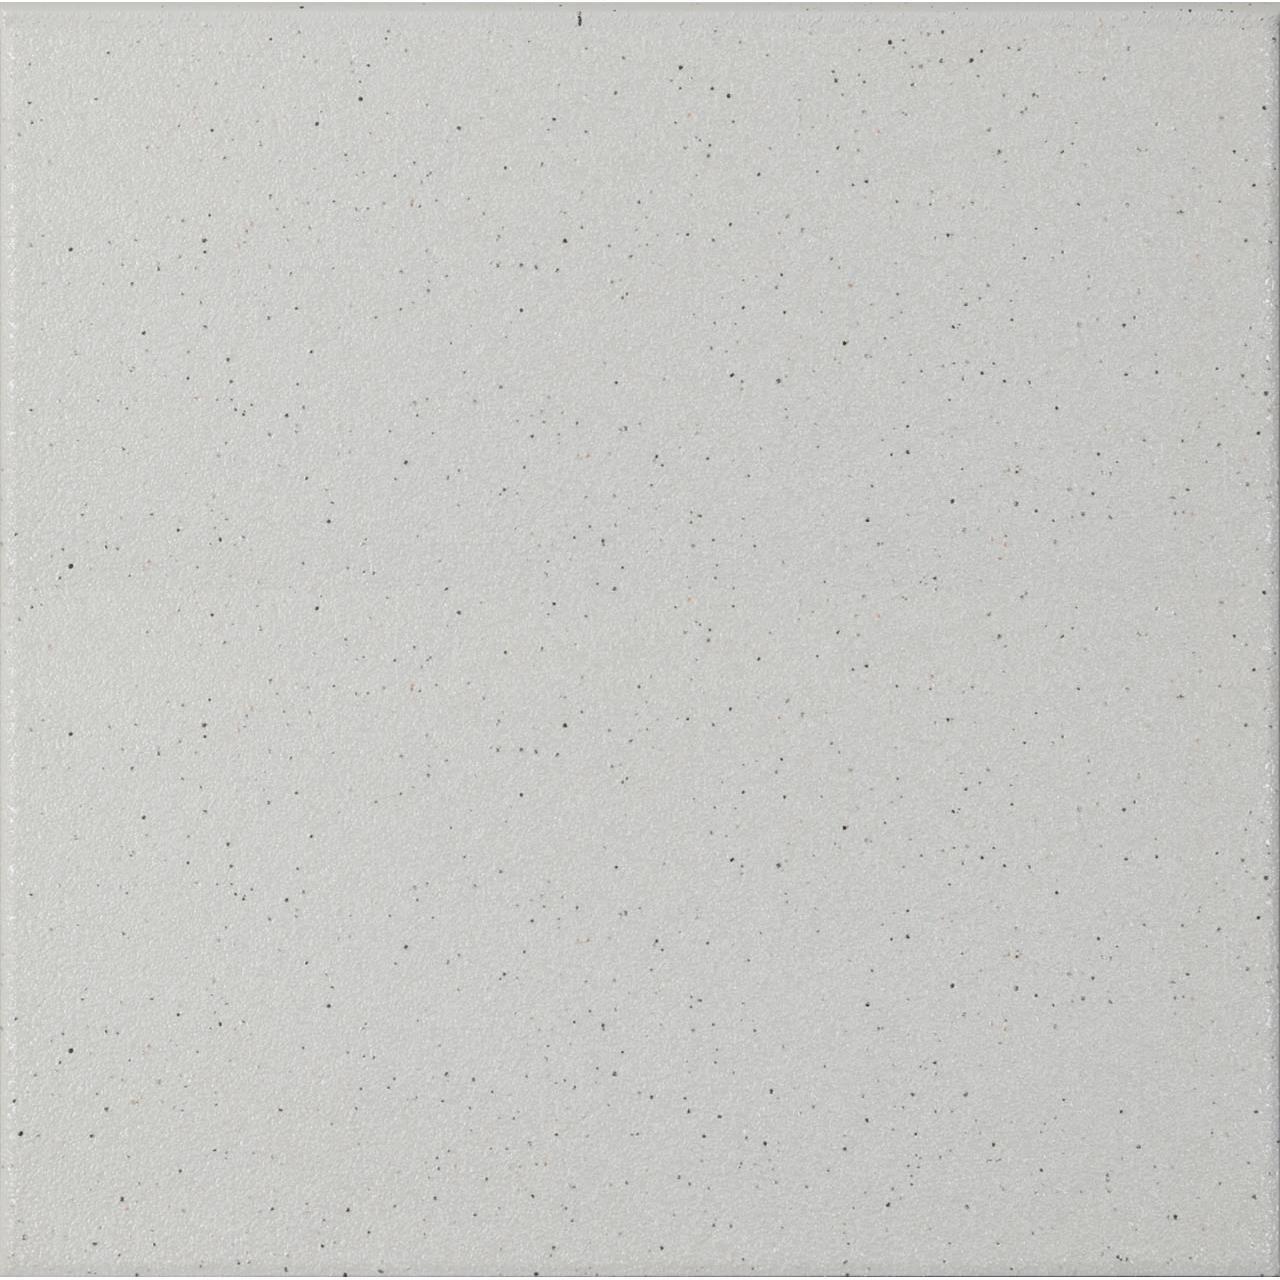 Ceramica Grife Gris Acetinado Tipo A Borda Bold 45x45cm 243M2 Cinza Claro - Eliane